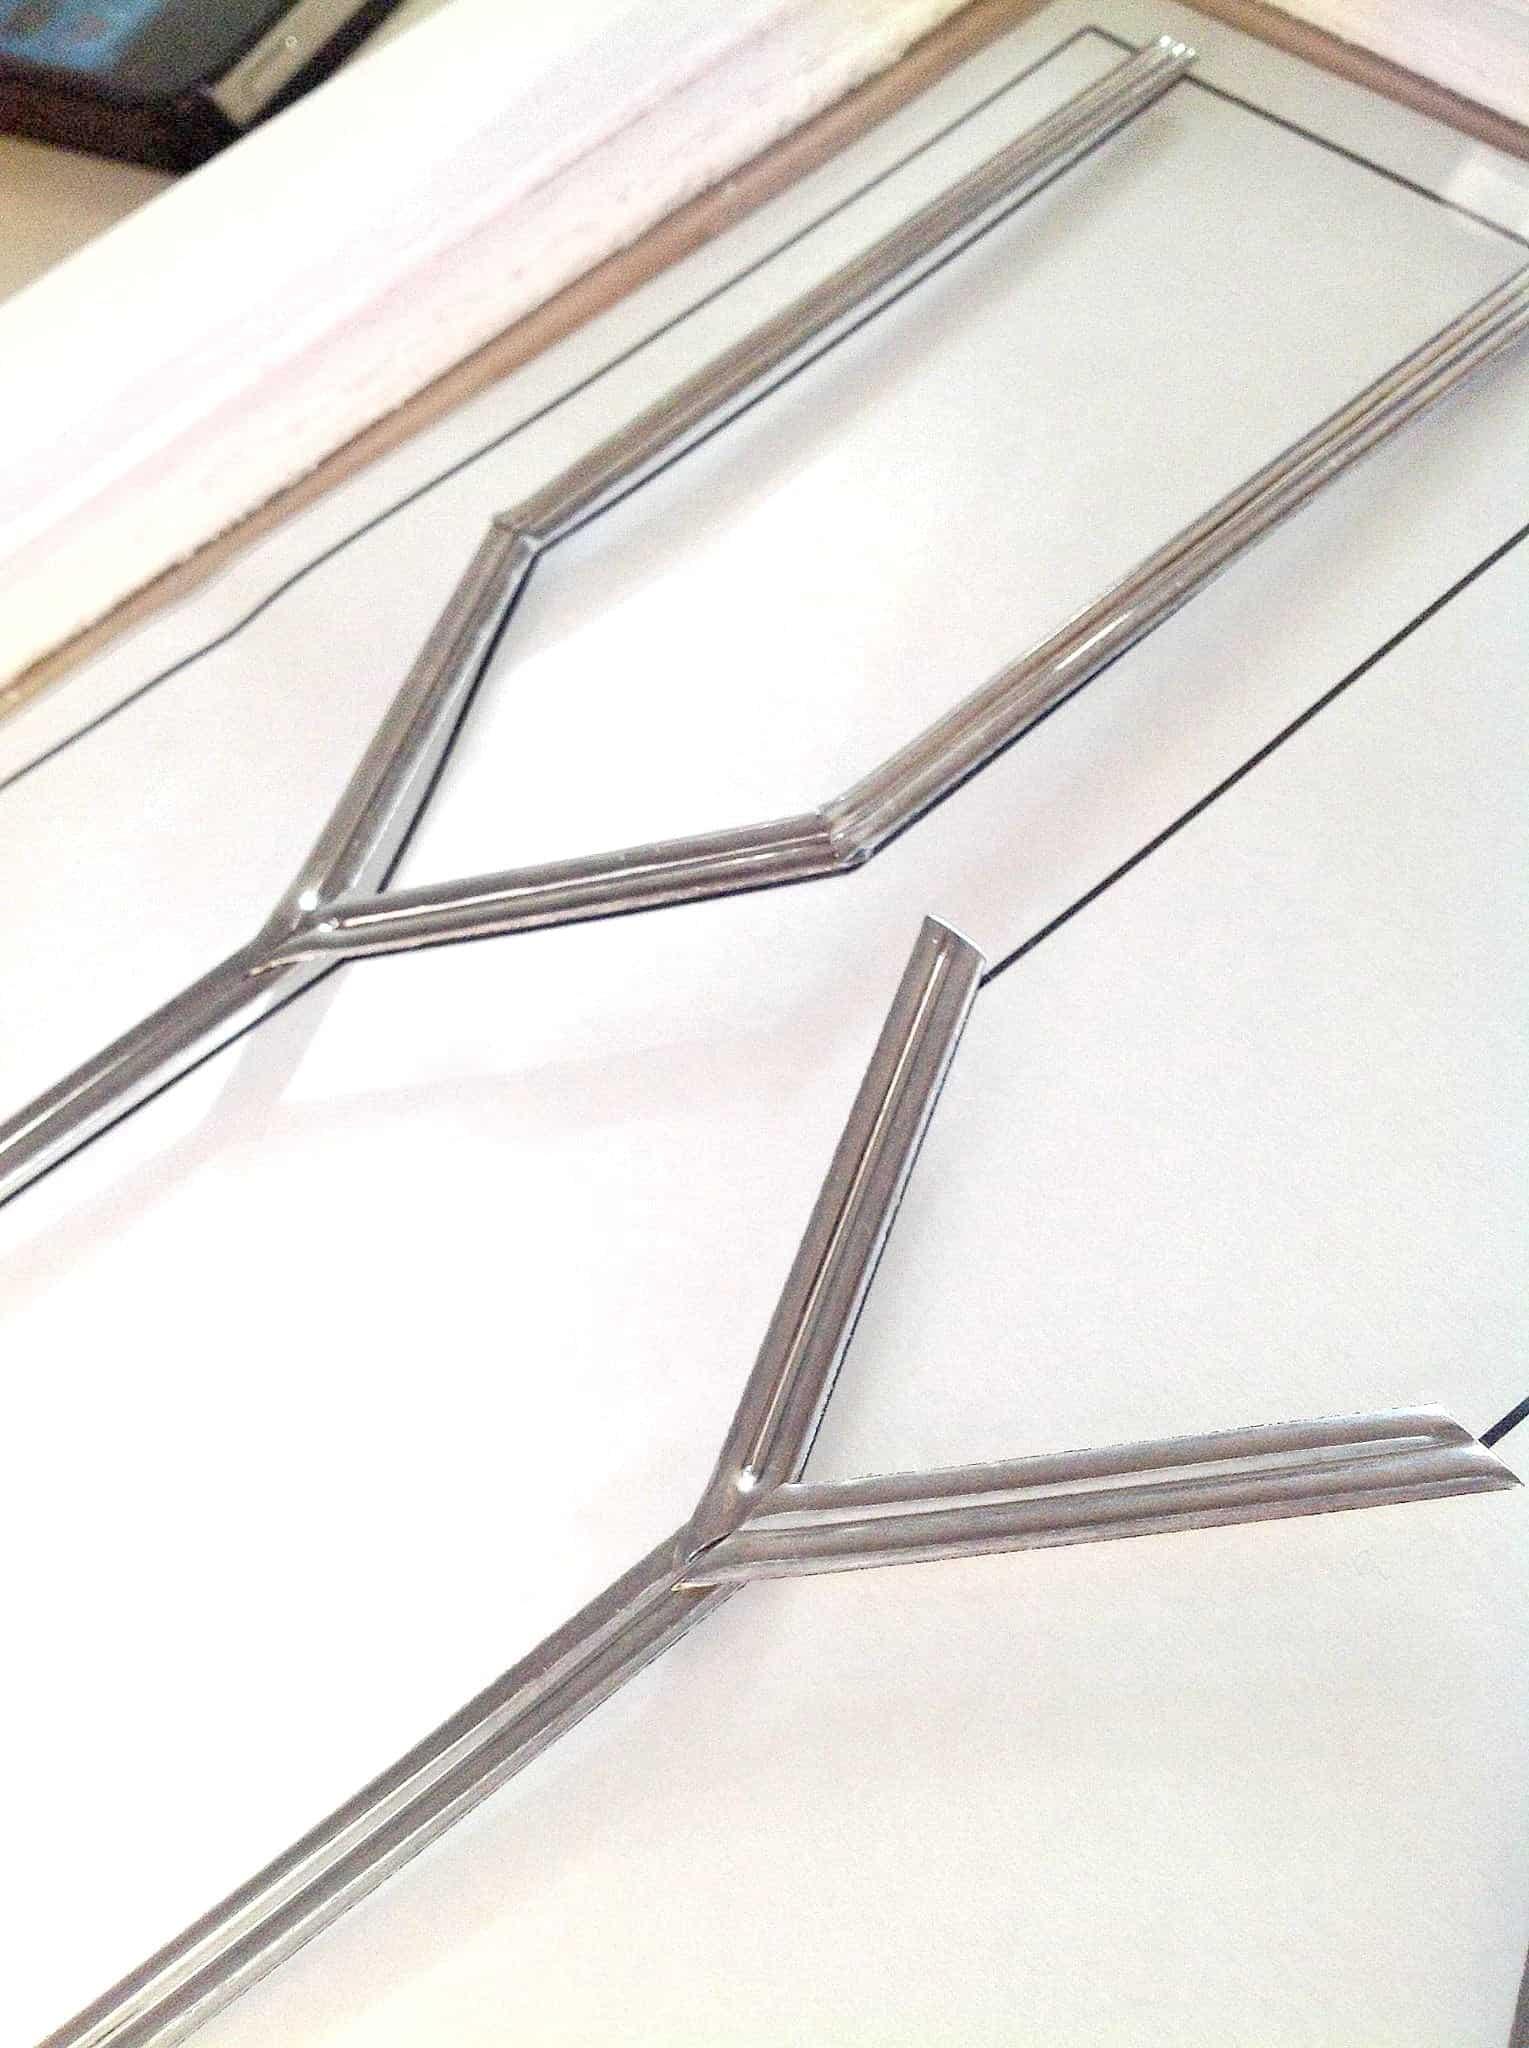 Window Glazing Strips : Diy faux leaded glass cabinets